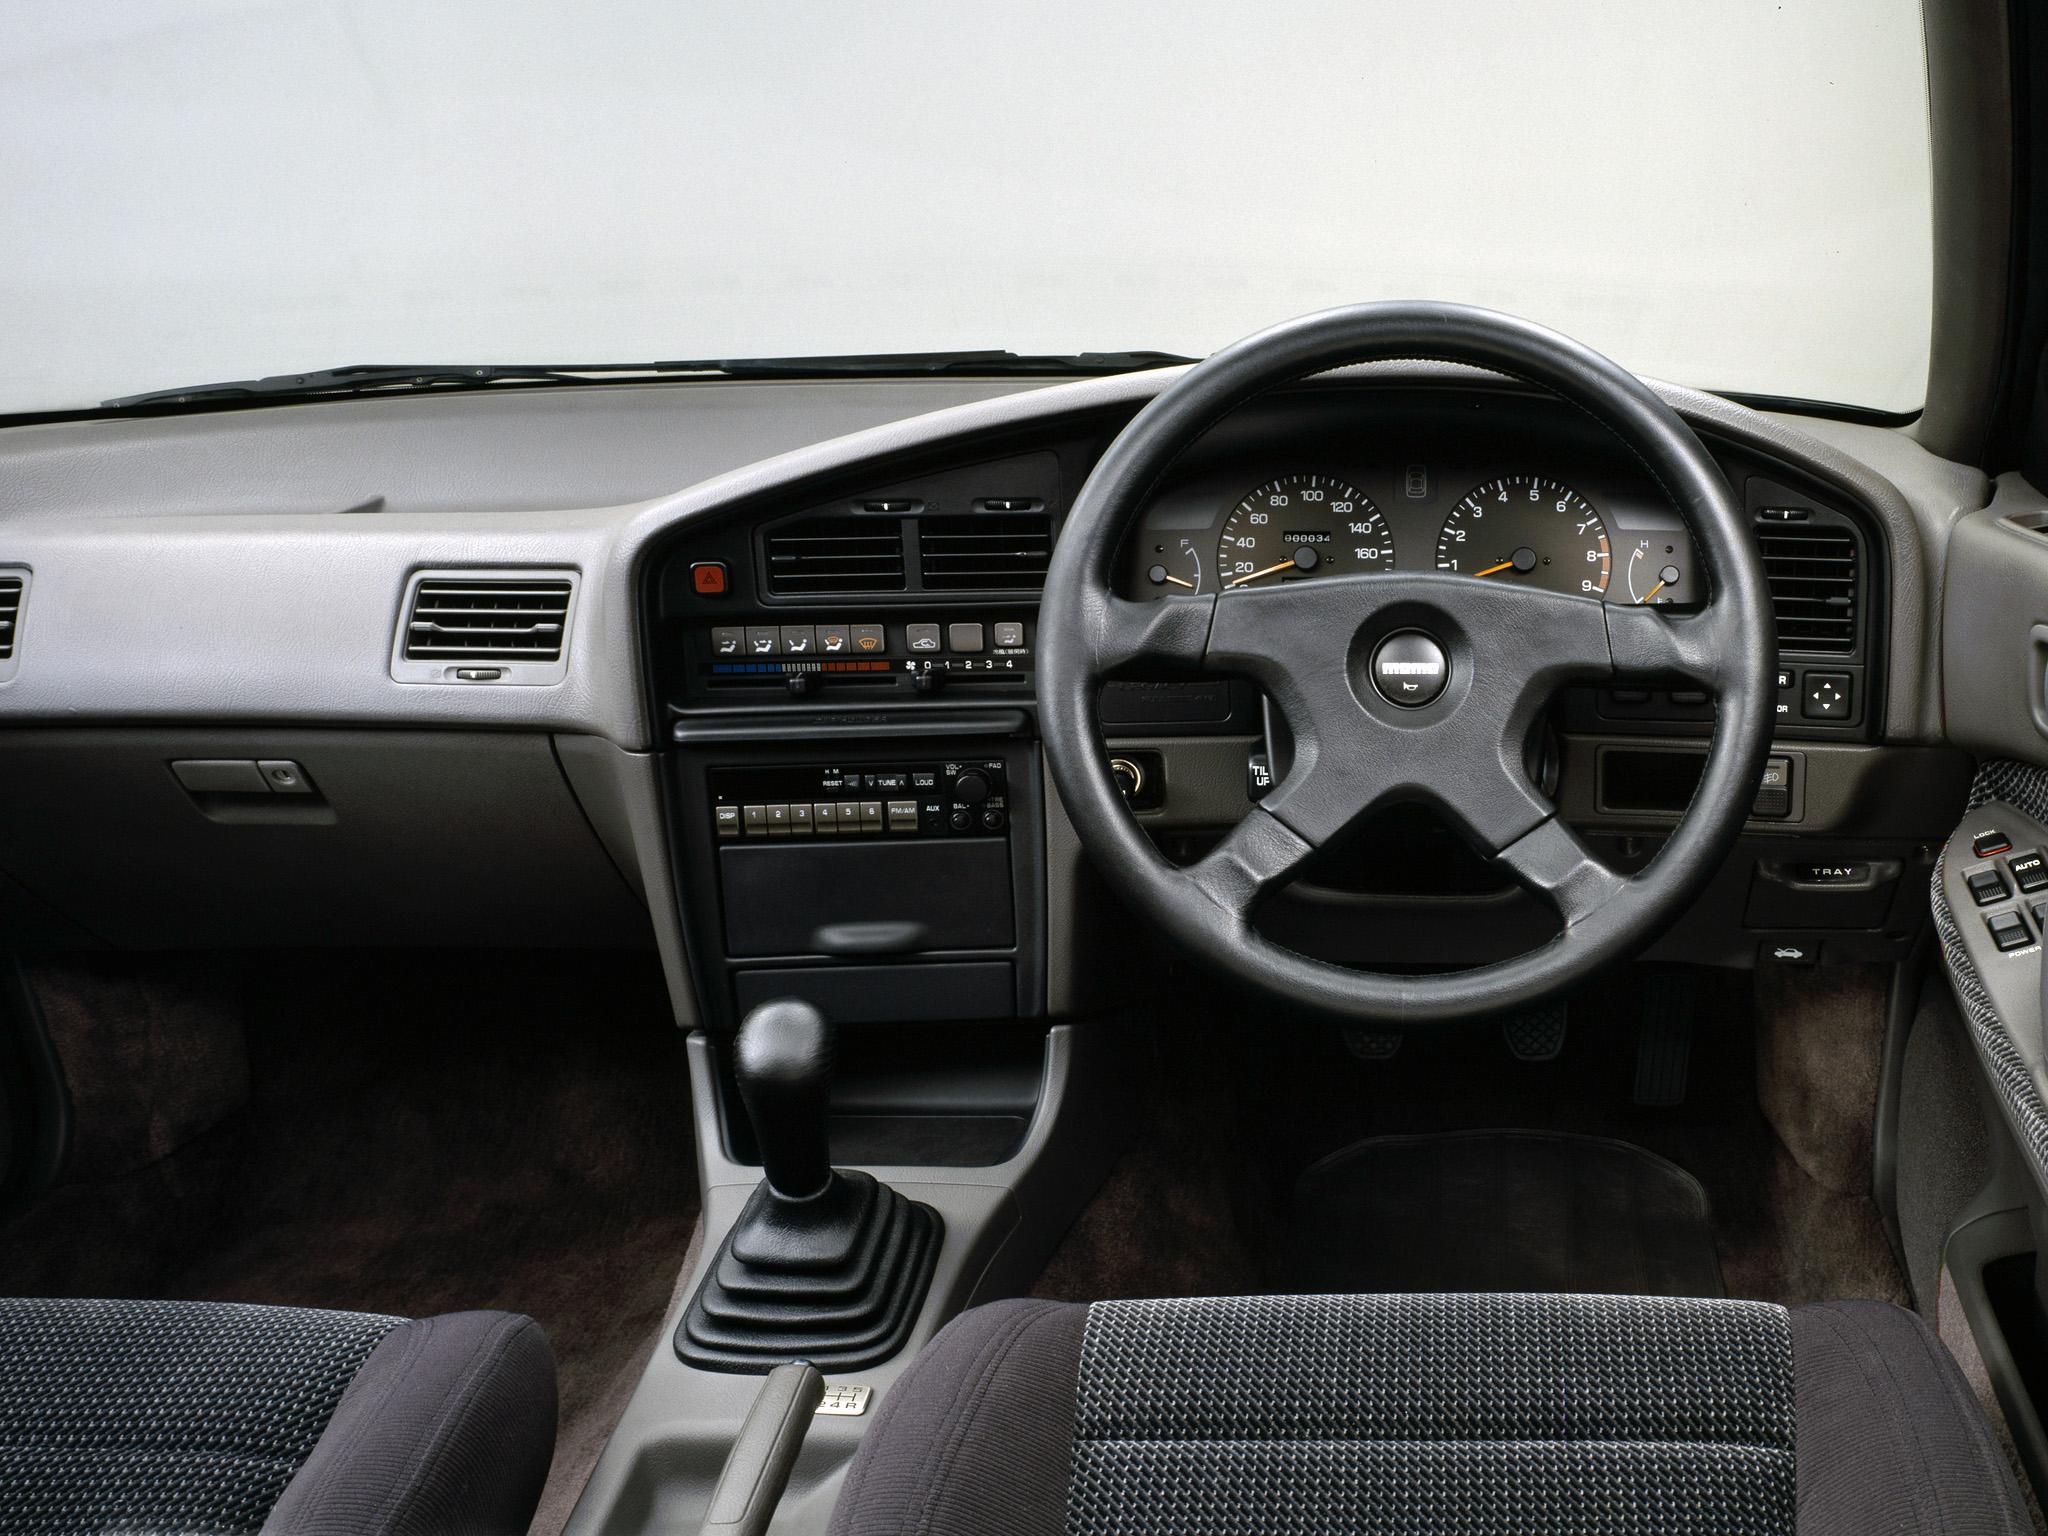 Subaru Legacy I 1989 - 1994 Sedan #2